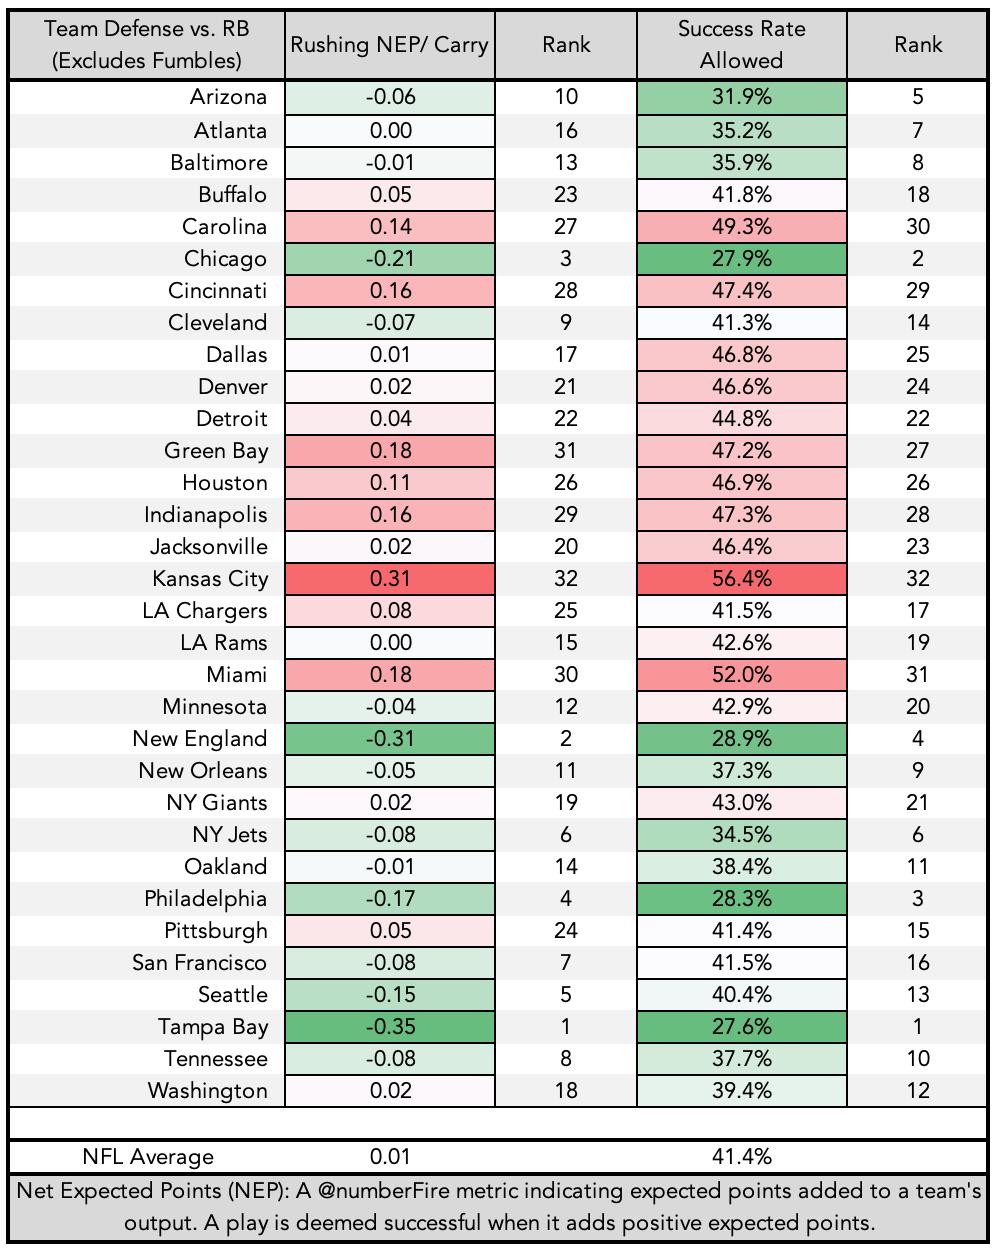 RB Rush Defense Through Week 3